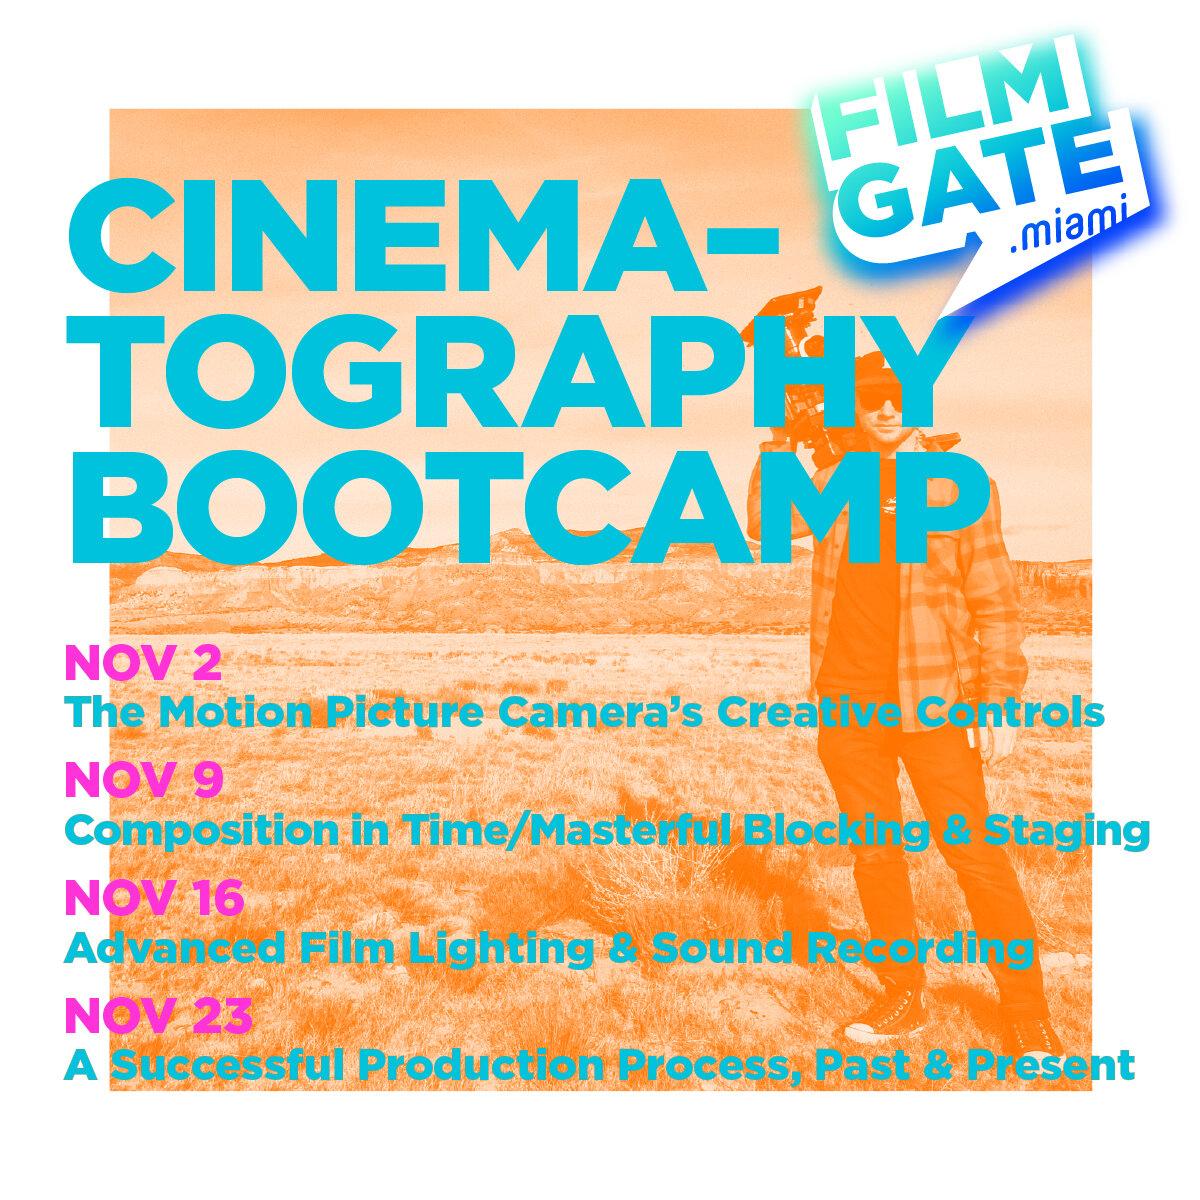 FG_CINEMATOGRAPHY-BOOTCAMP_insta_NOVEMBER_2.jpg